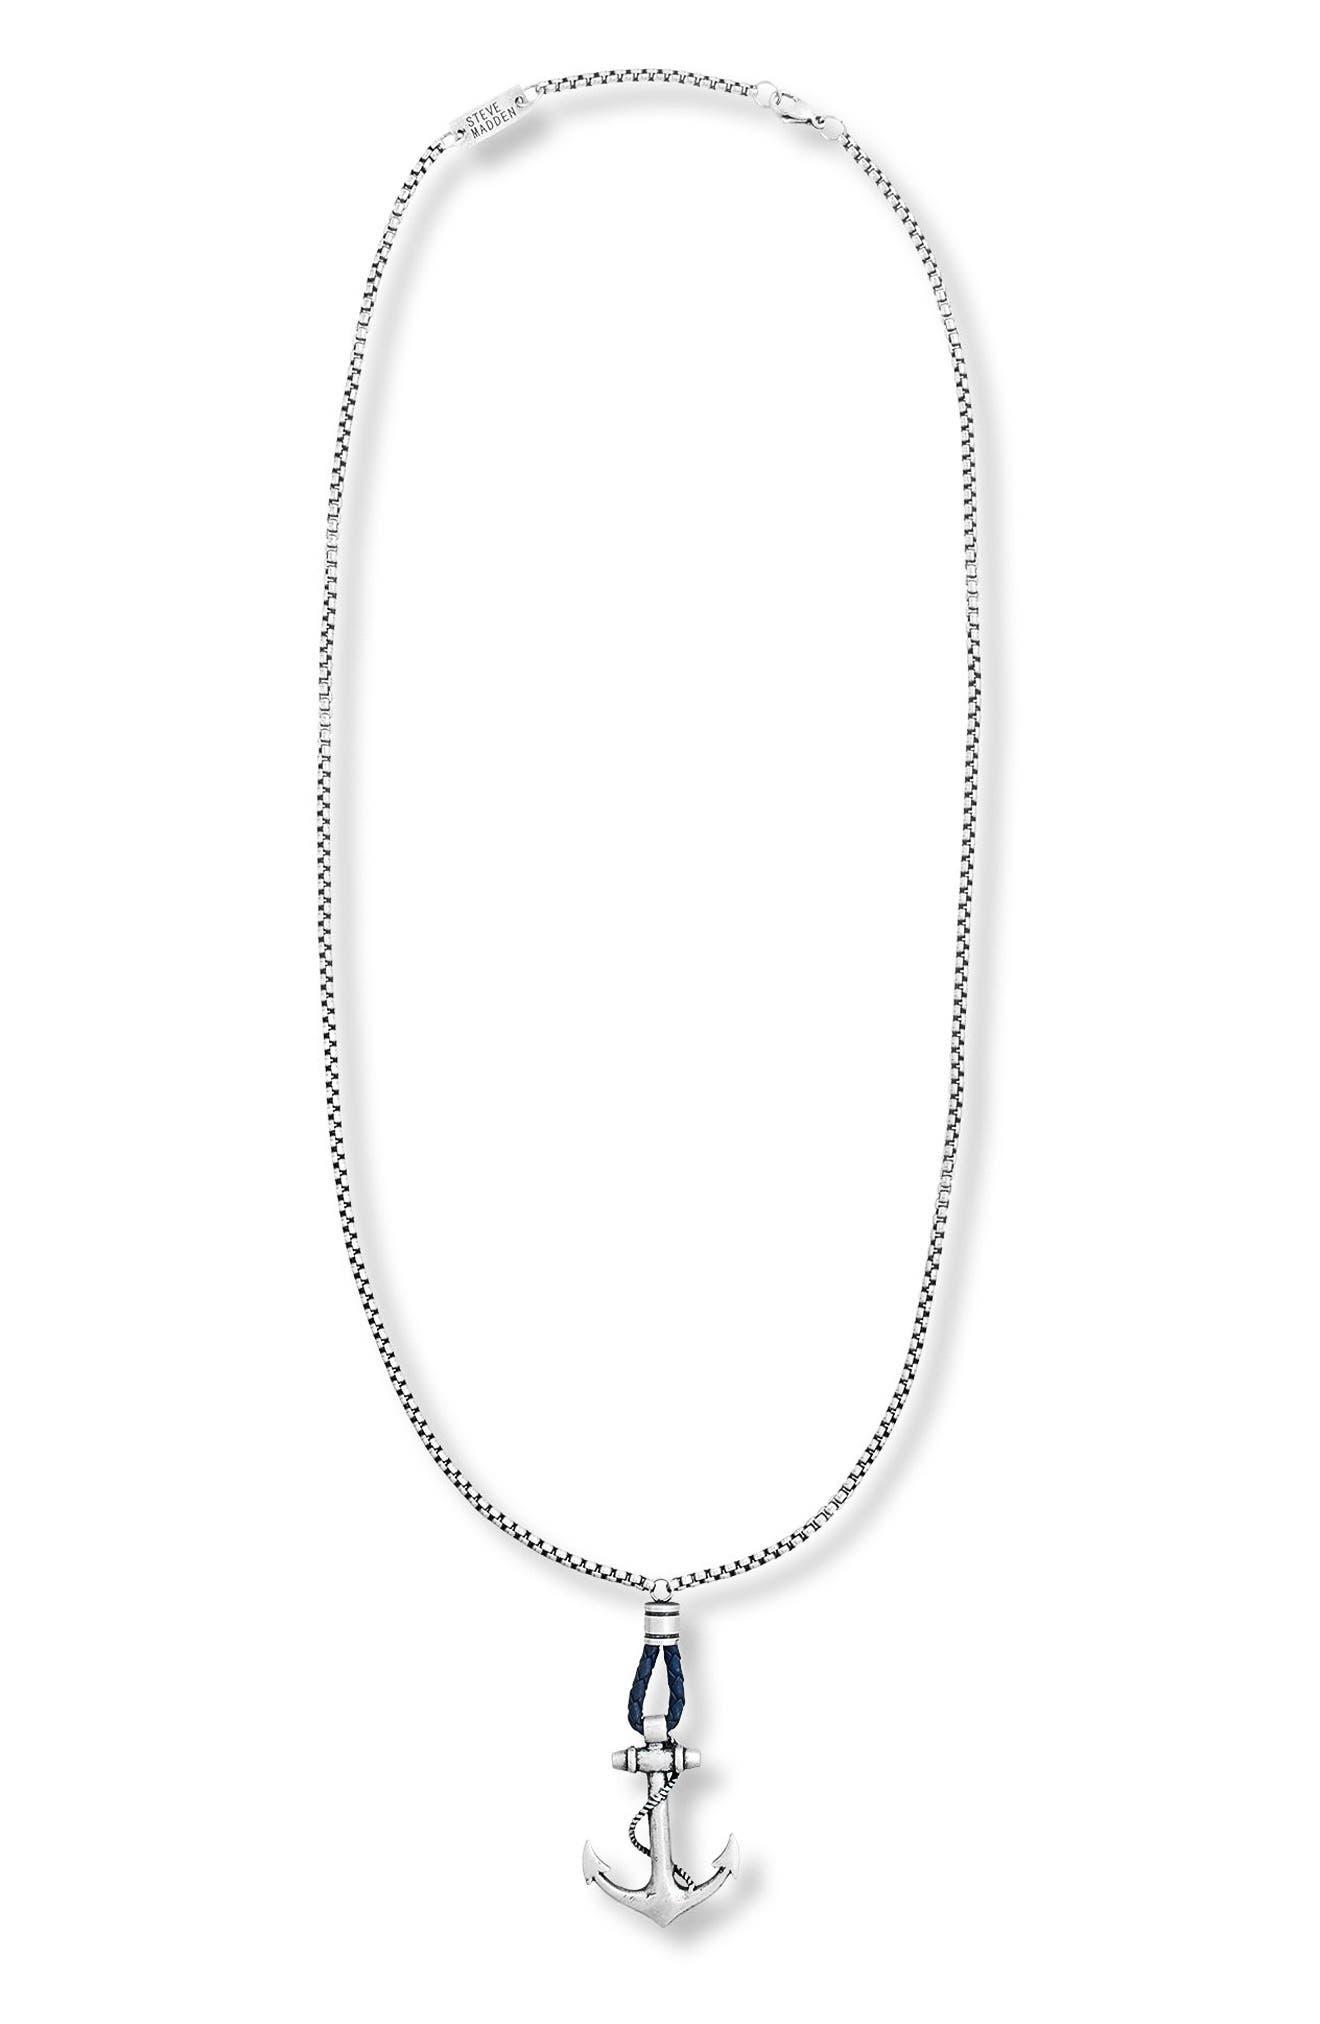 Oxidized Anchor Pendant Necklace,                             Main thumbnail 1, color,                             401